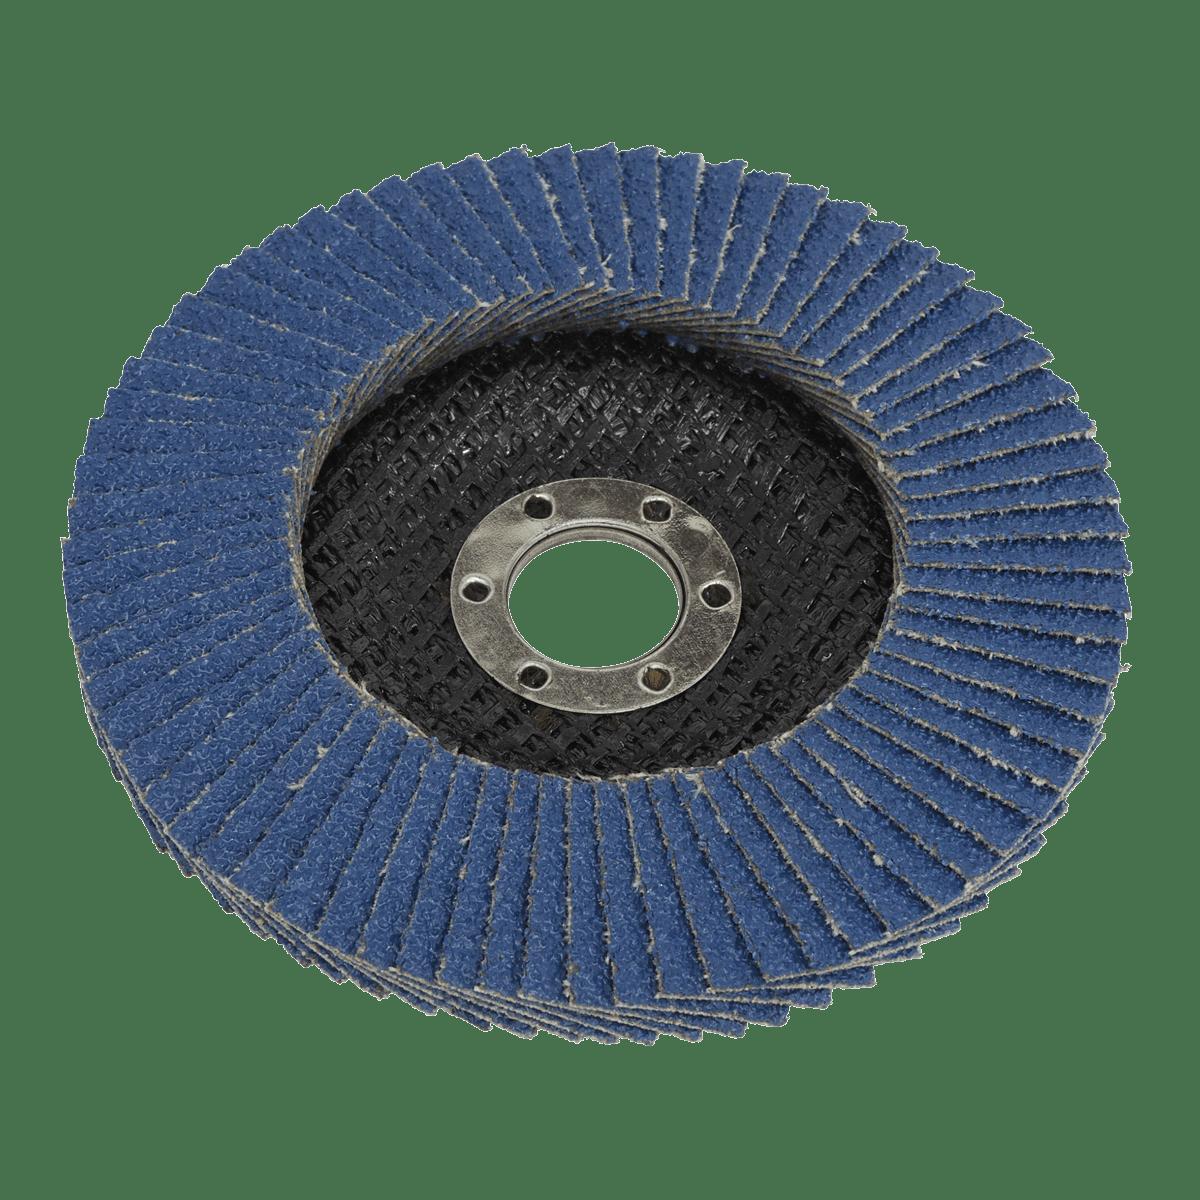 Sealey Flap Disc Zirconium Ø100mm Ø16mm Bore 40Grit FD10040   Zirconium flap disc for descaling, derusting, weld preparation, weld cleaning and general surface preparation.   toolforce.ie